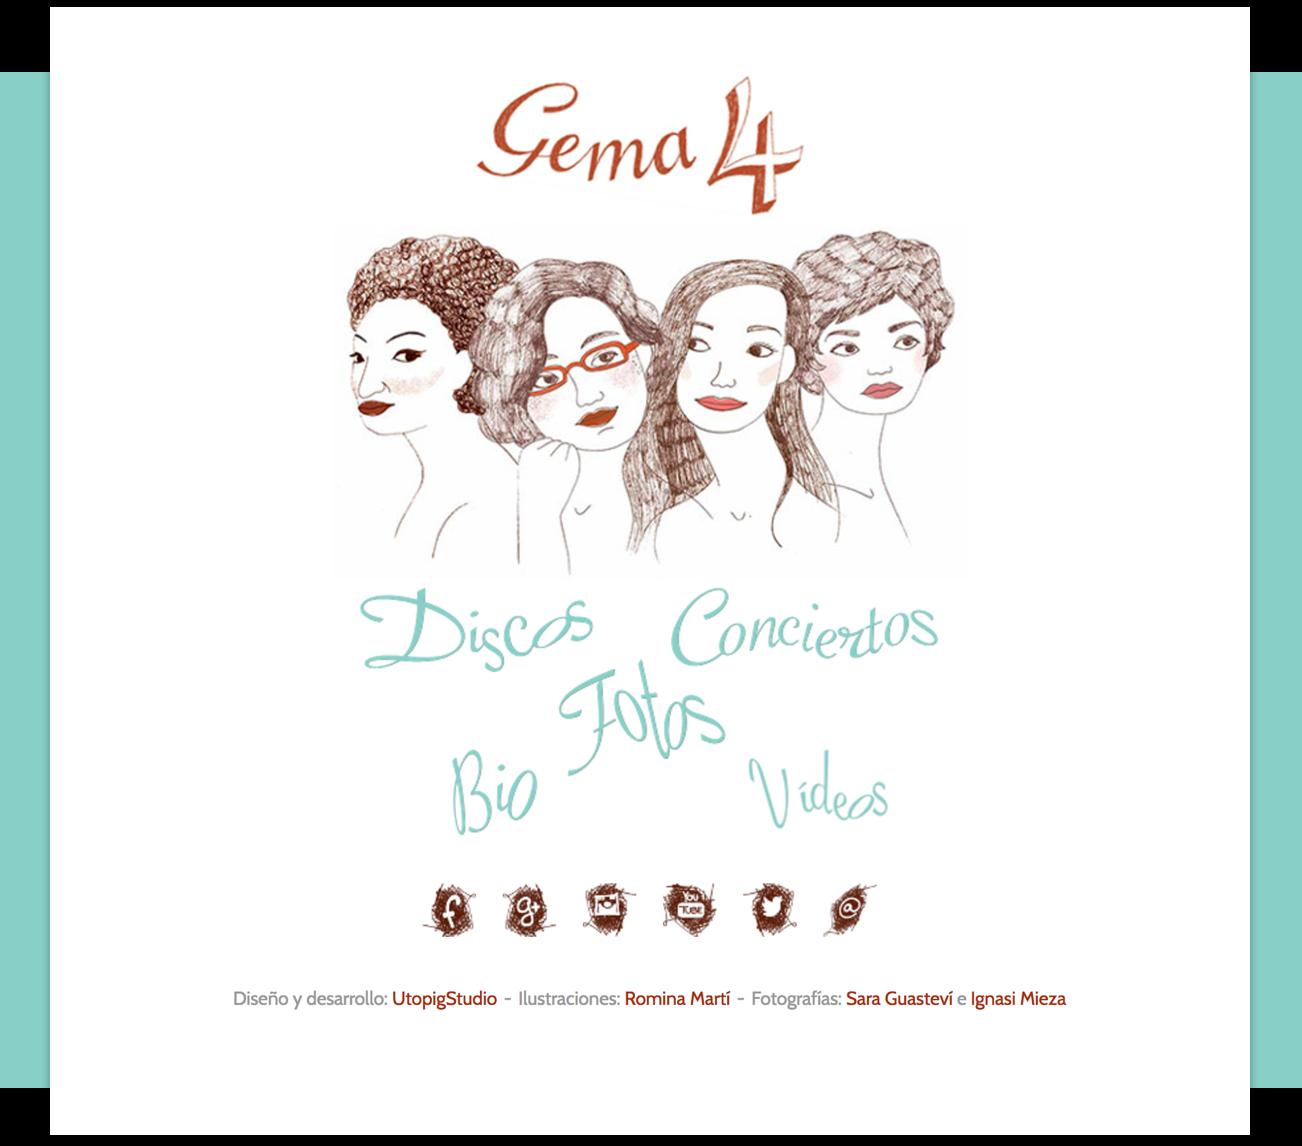 Gema 4 Homepage – by Utopig Studio